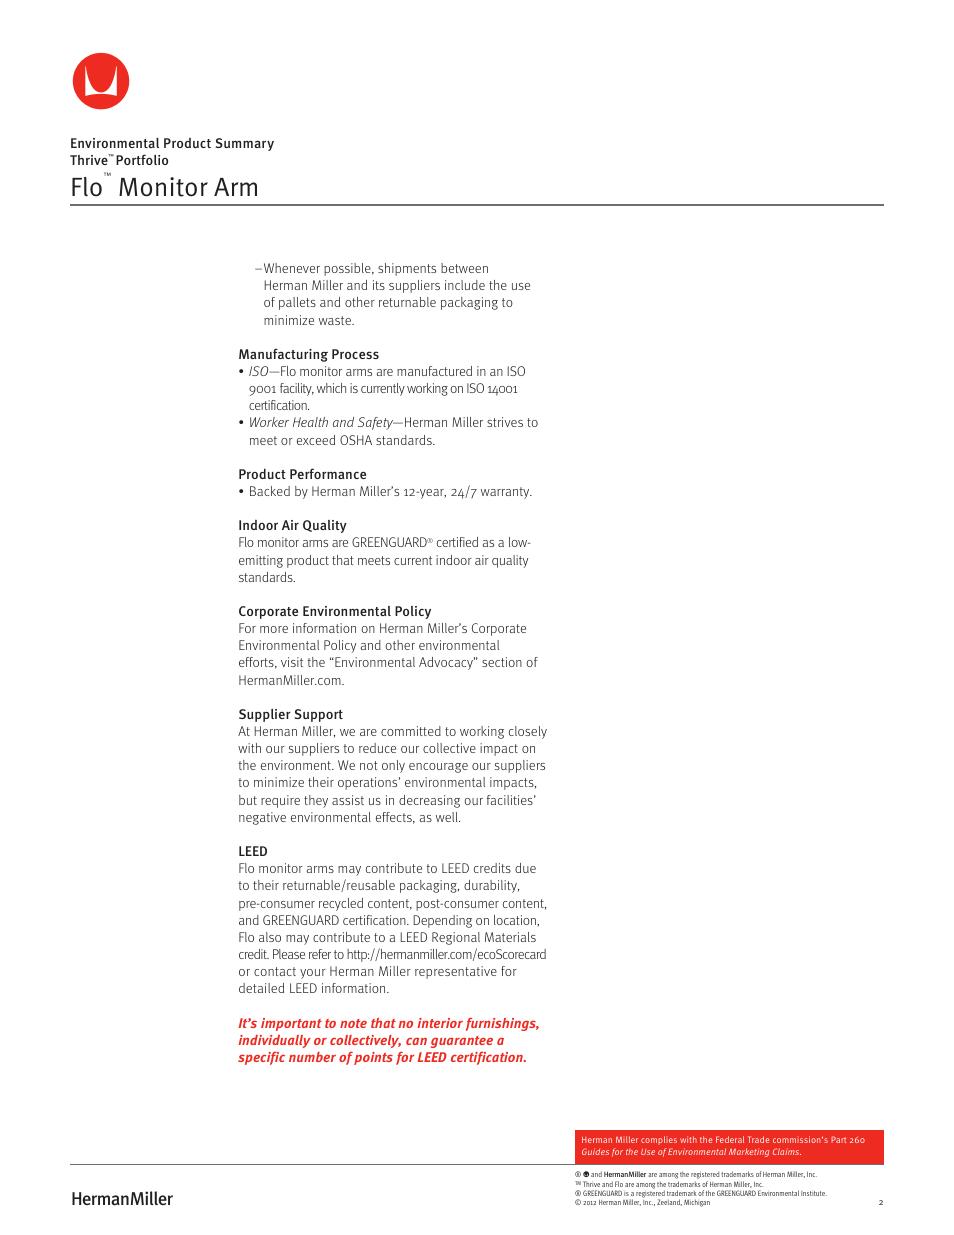 Monitor Arm Herman Miller Flo Monitor Supports Environmental